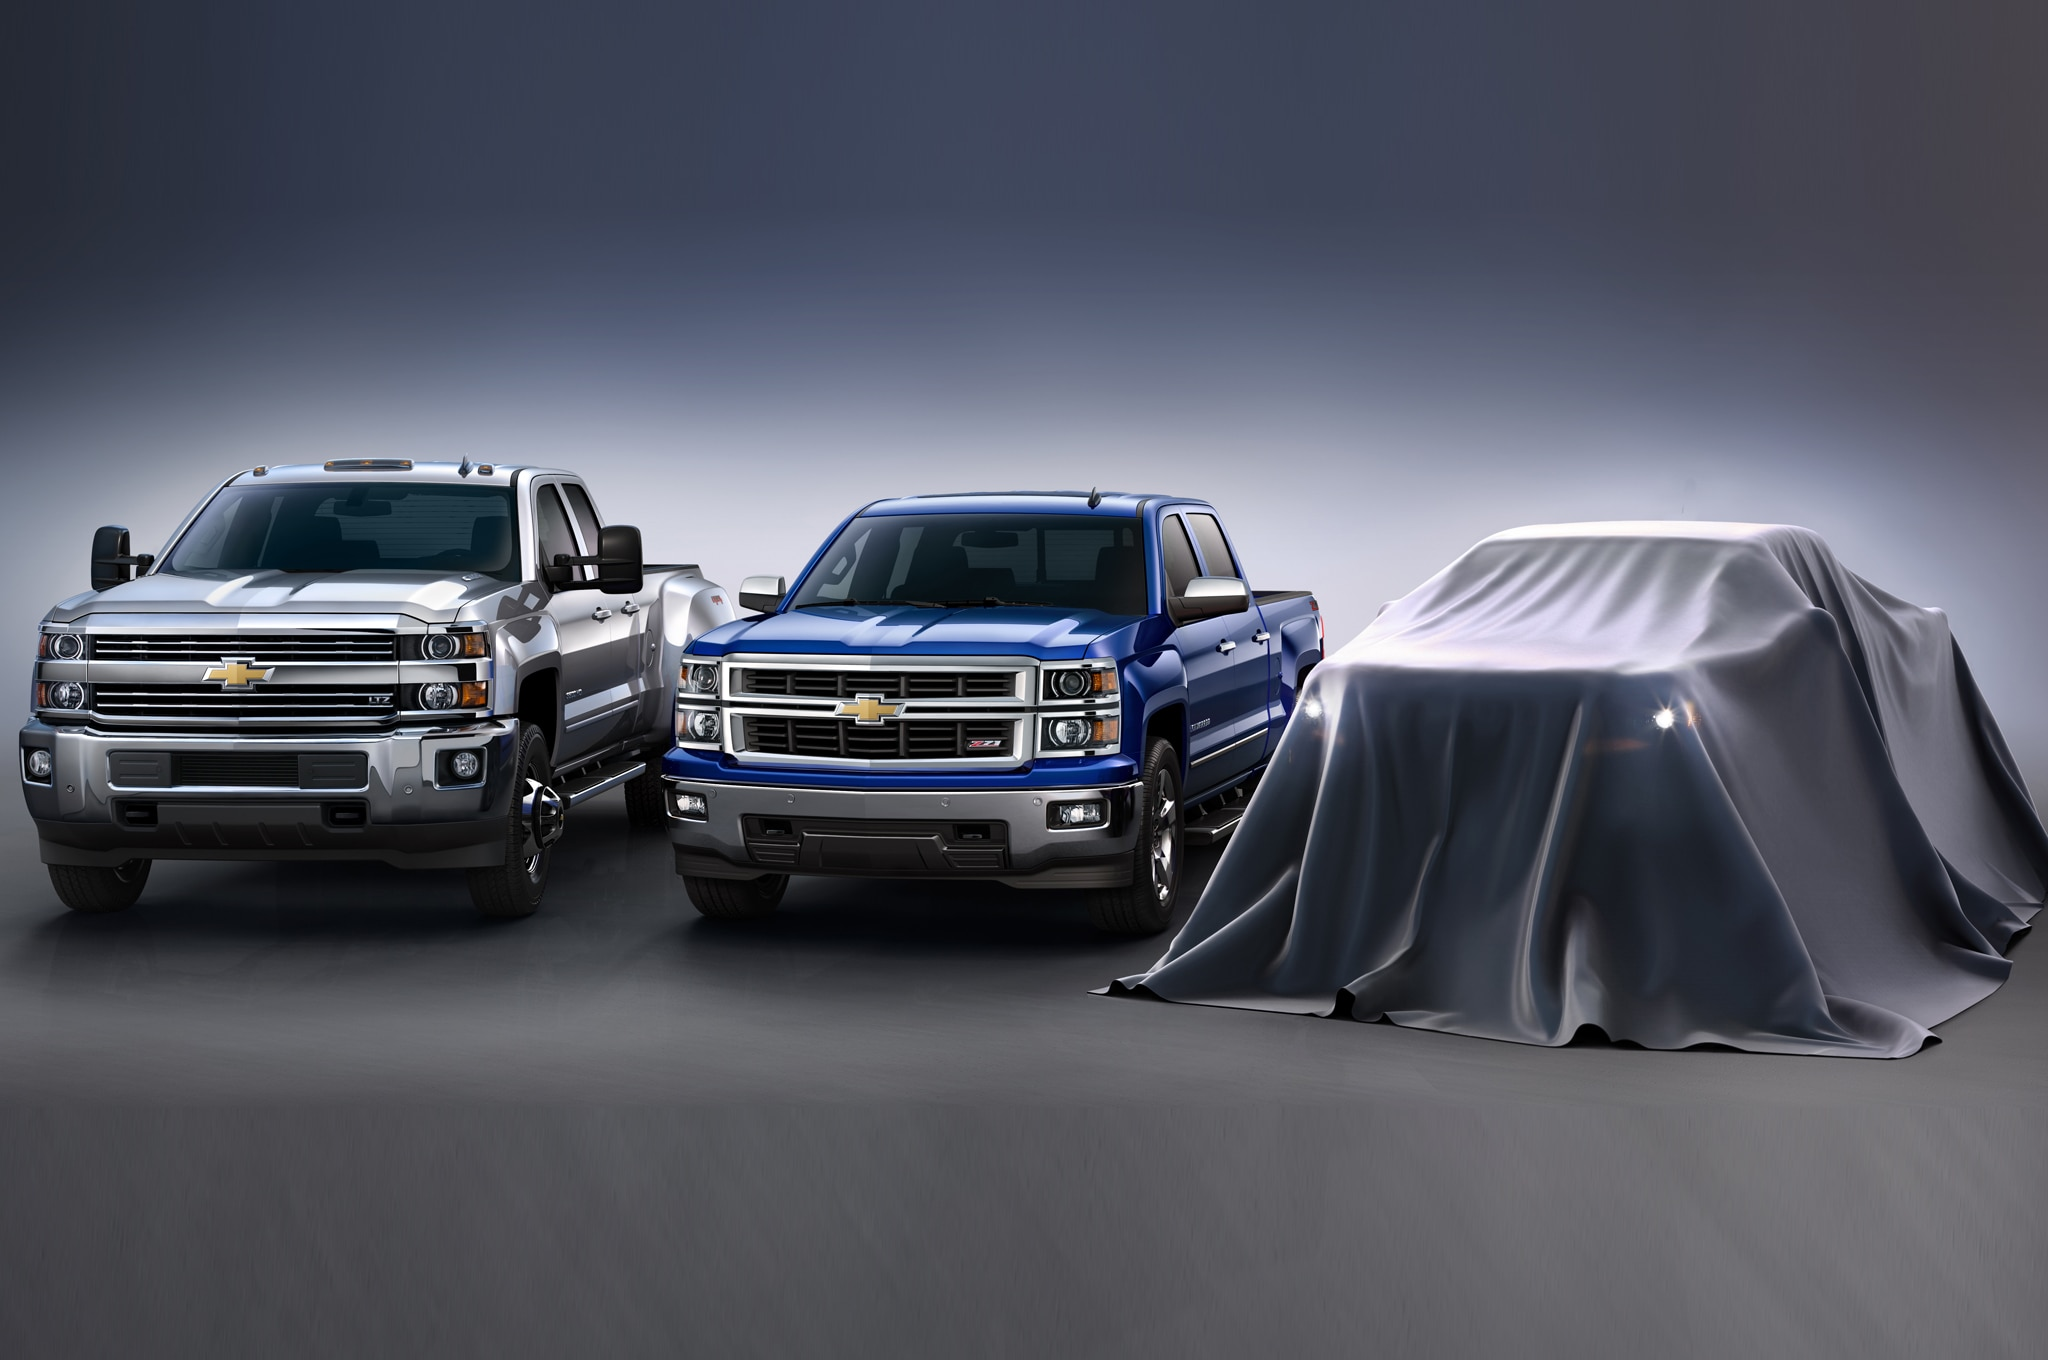 2015 Chevrolet Colorado Teaser Image1